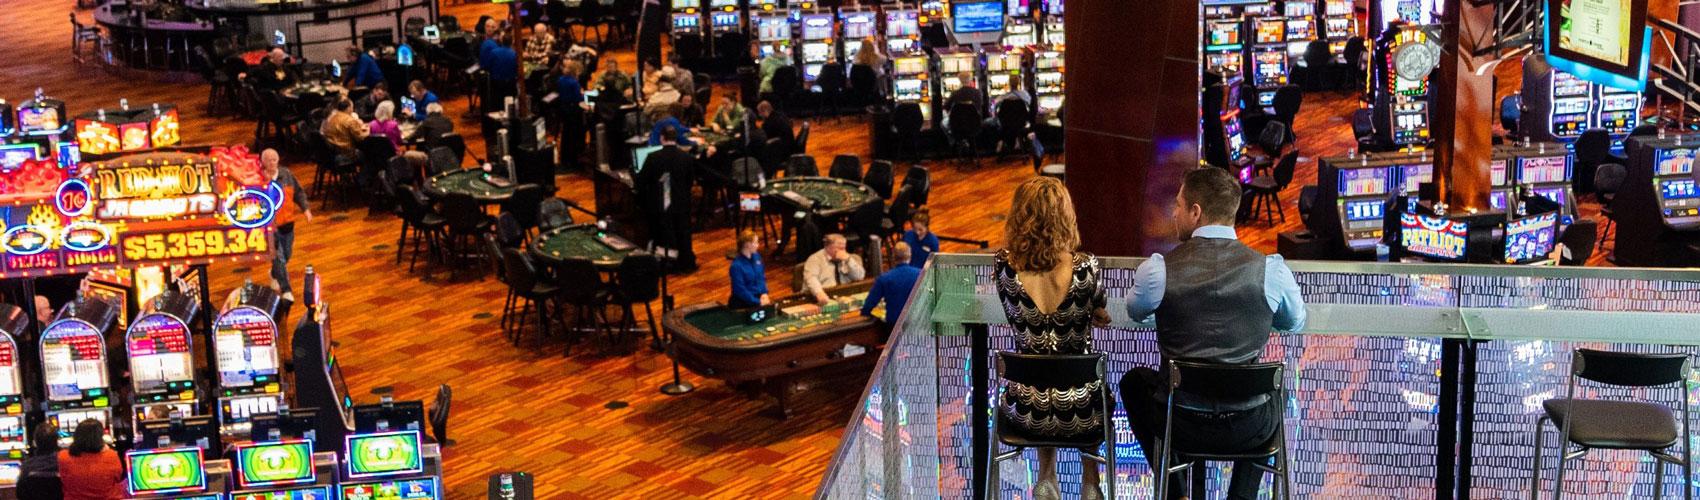 Turle creek casino neverwinter nights 2 game manual download